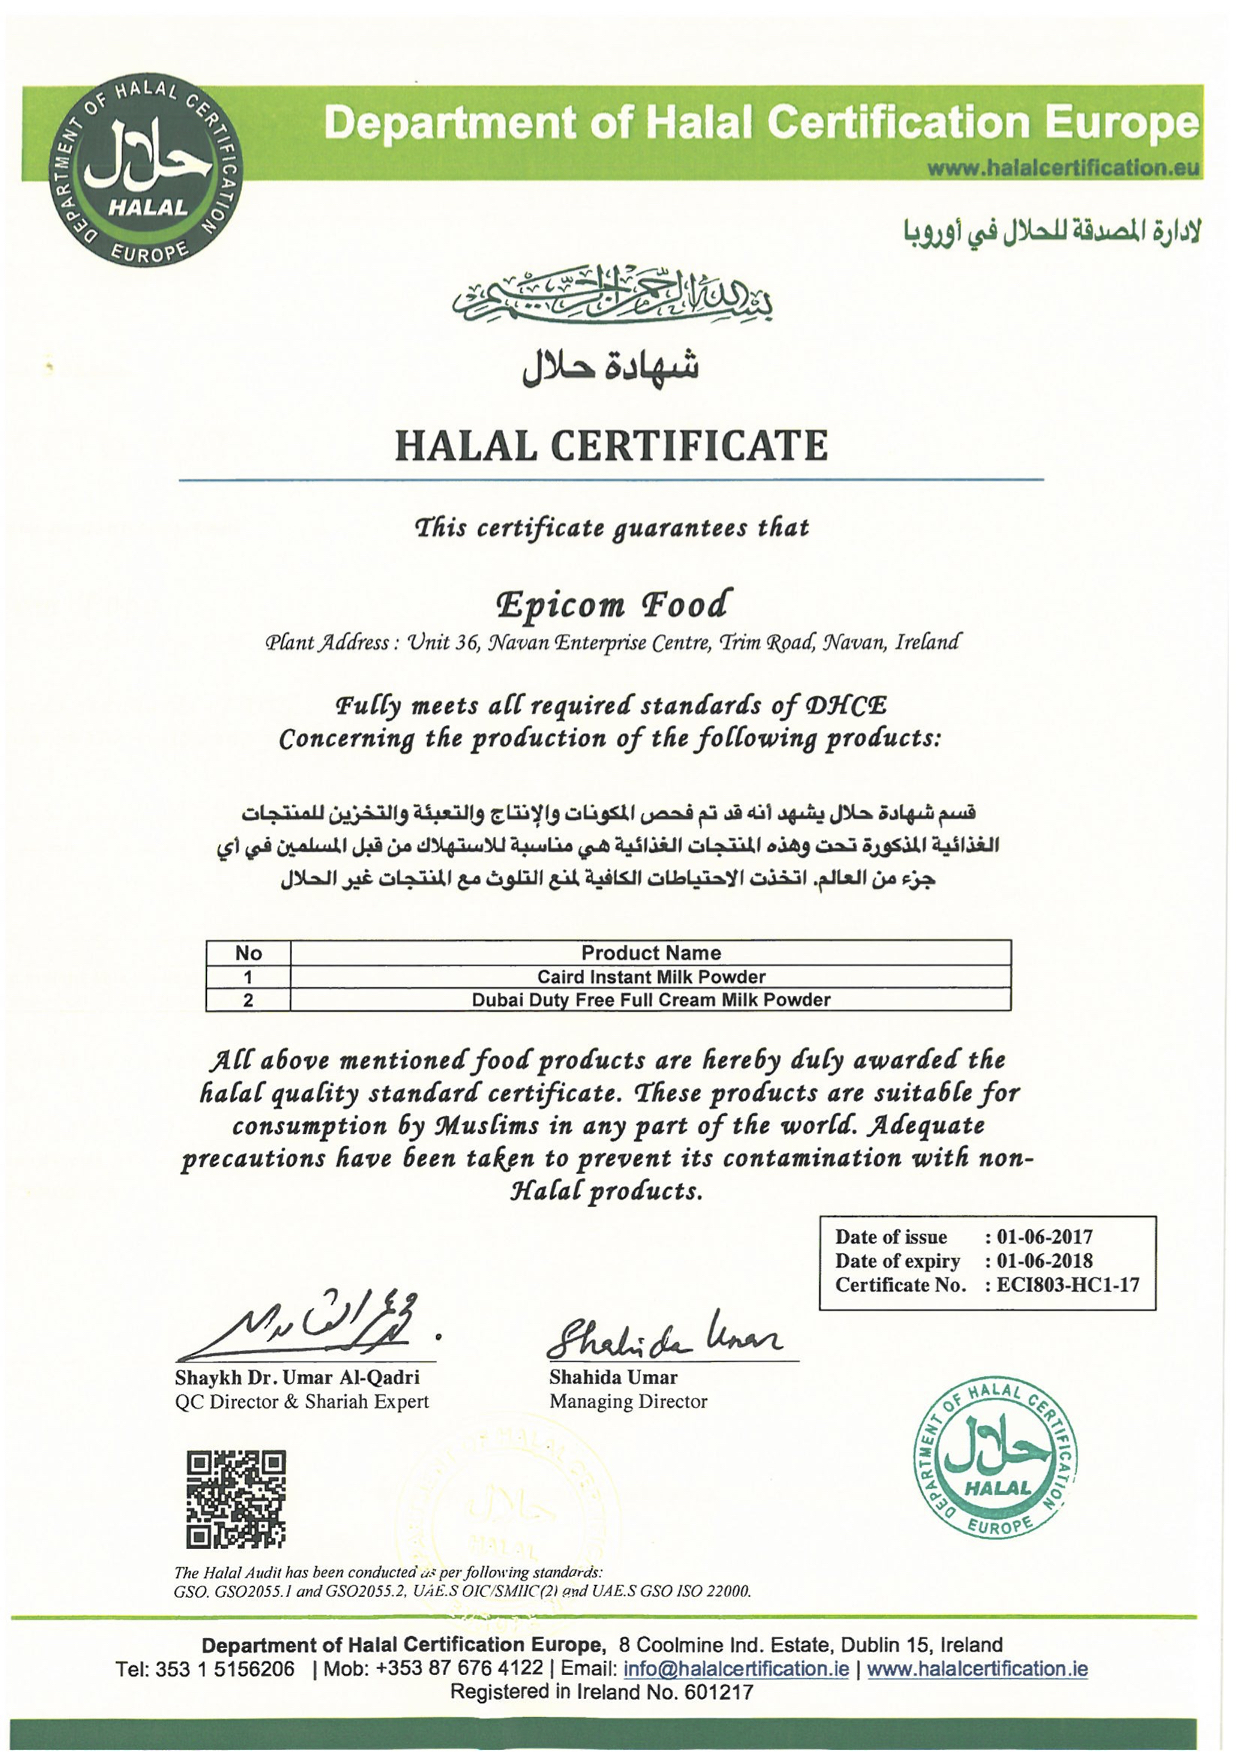 Epicom Halal Cert Products 2017